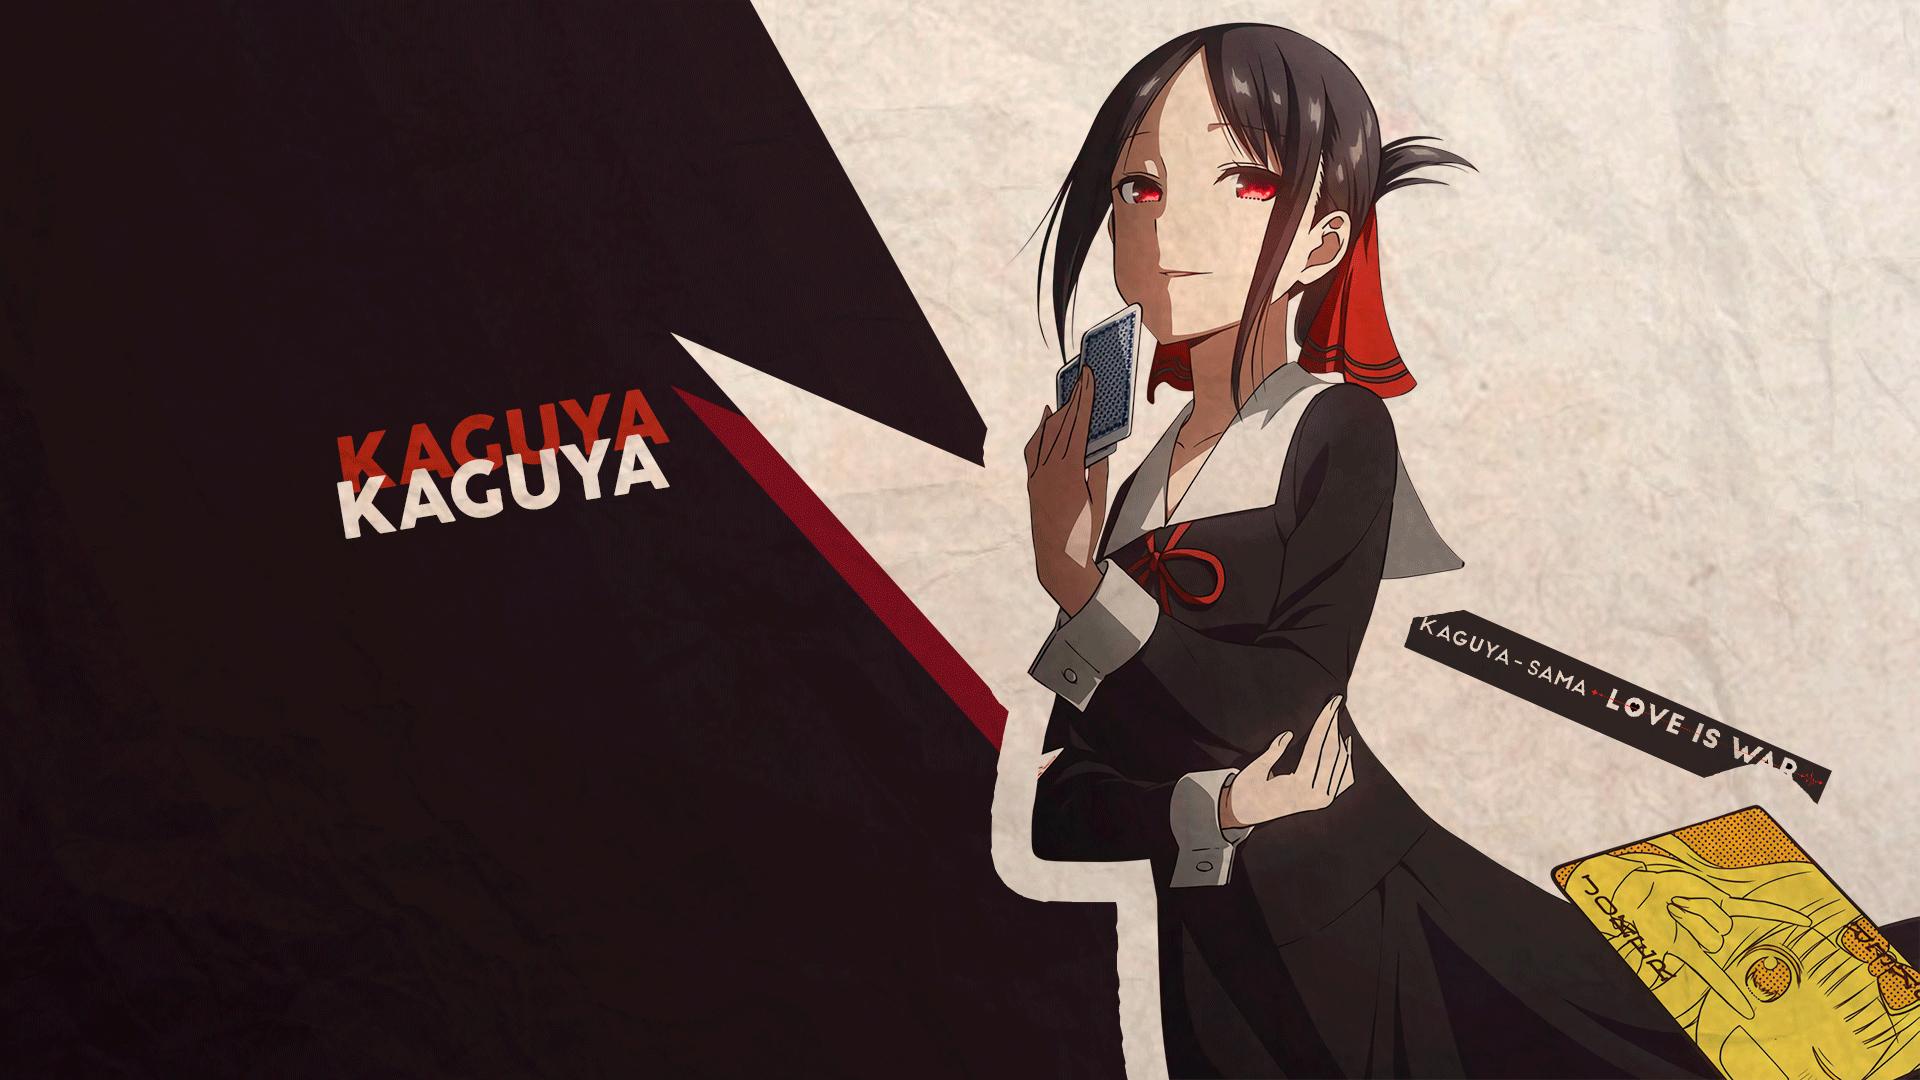 1360x768 Kaguya Shinomiya Love Is War Desktop Laptop Hd Wallpaper